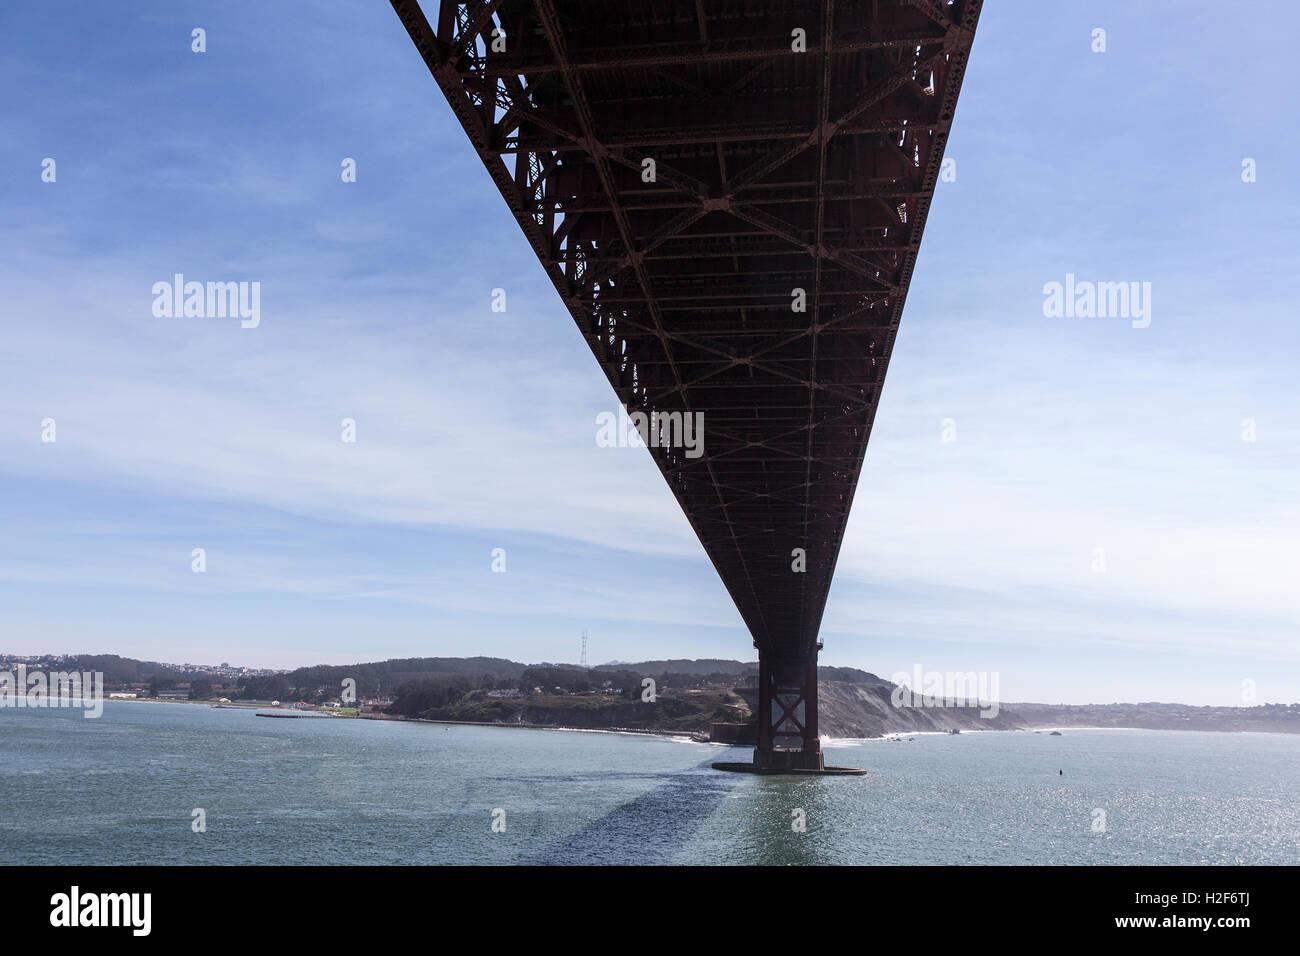 Under the Golden Gate Bridge in San Francisco Bay. - Stock Image